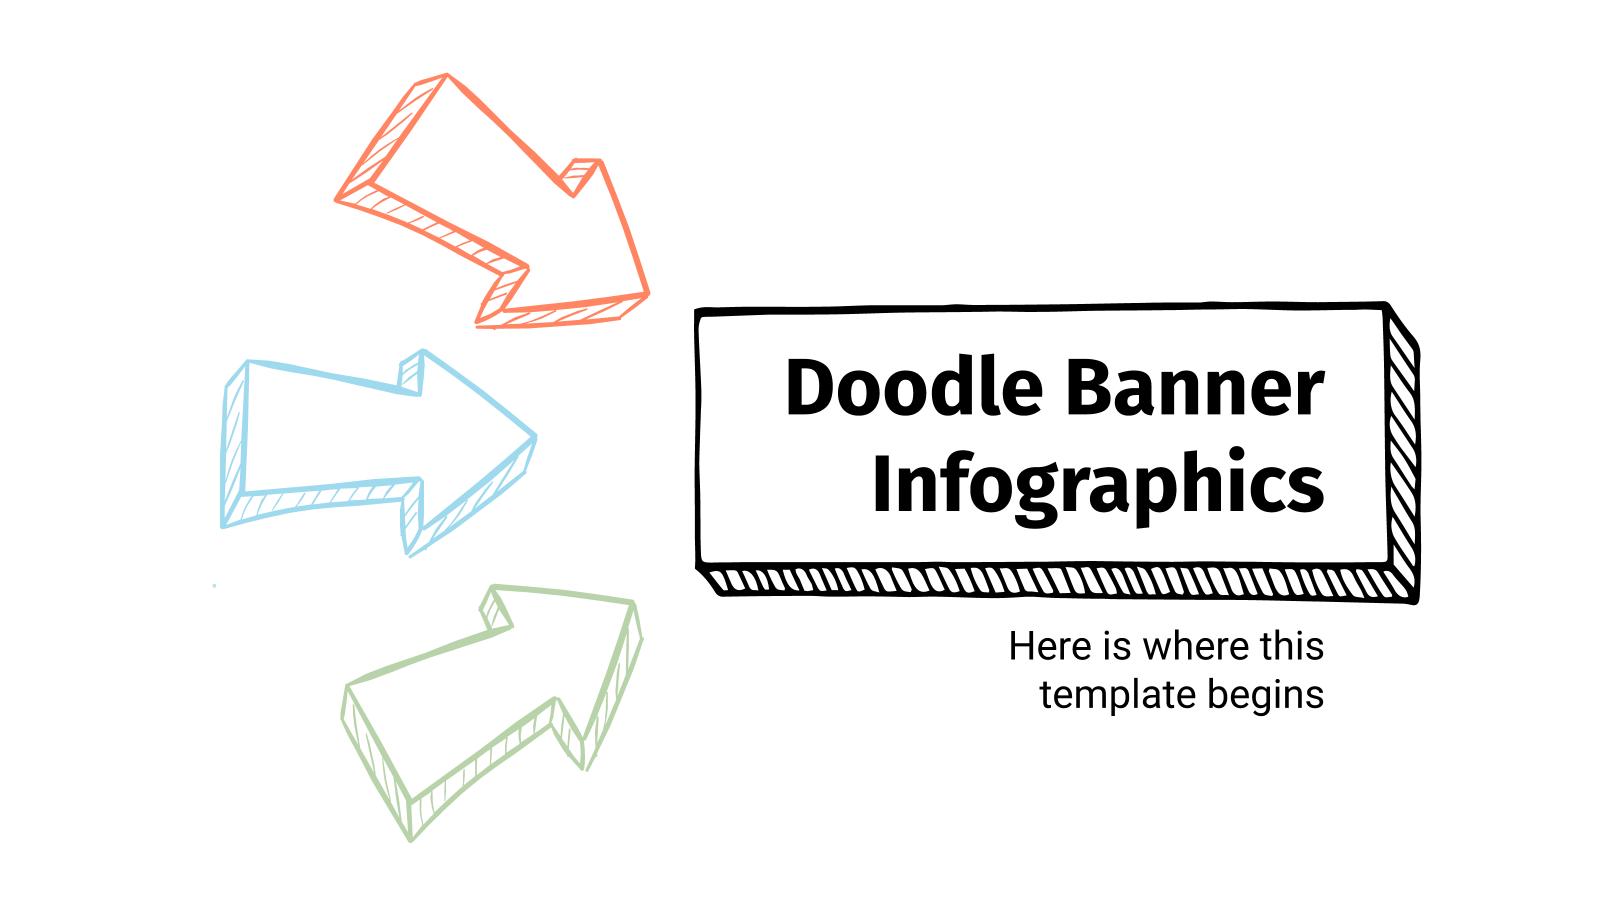 Doodle Banner Infographics presentation template